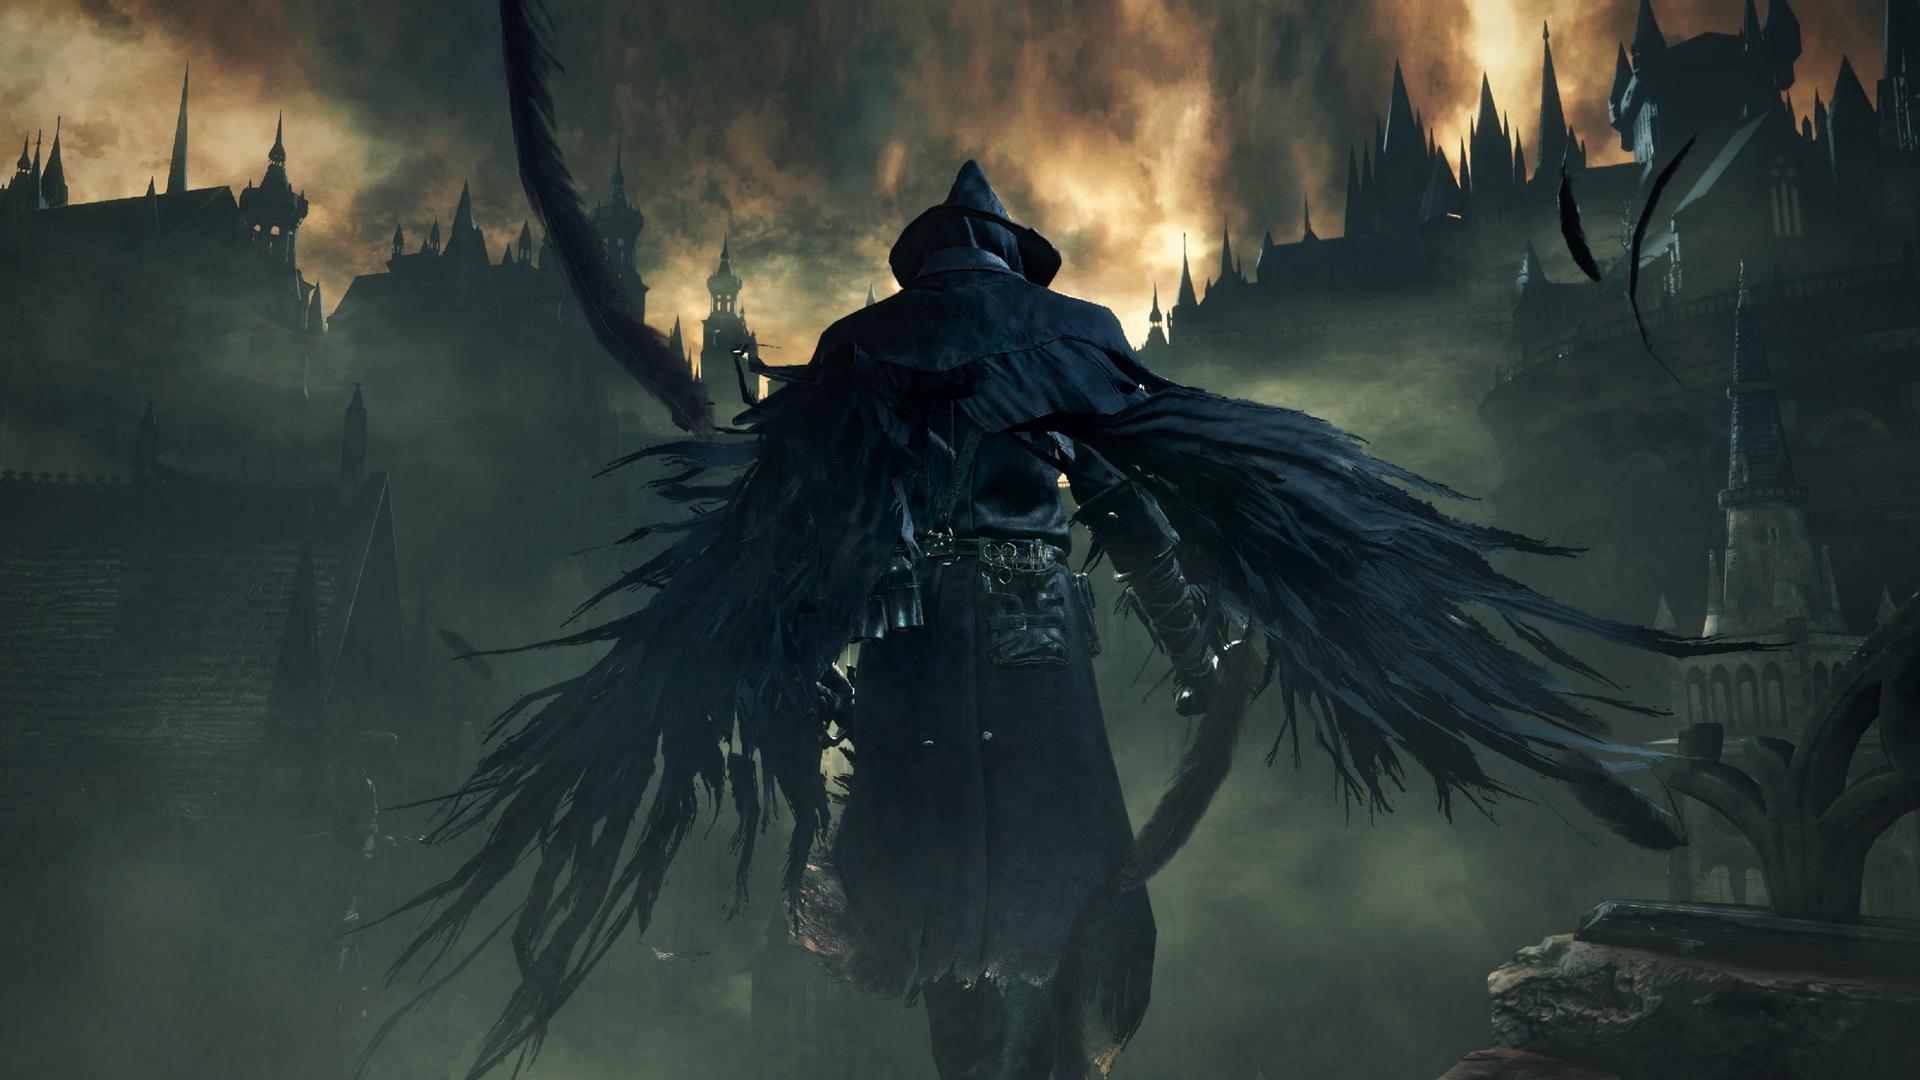 1920x1080 Bloodborne Dark Souls Wings 1080p Laptop Full Hd